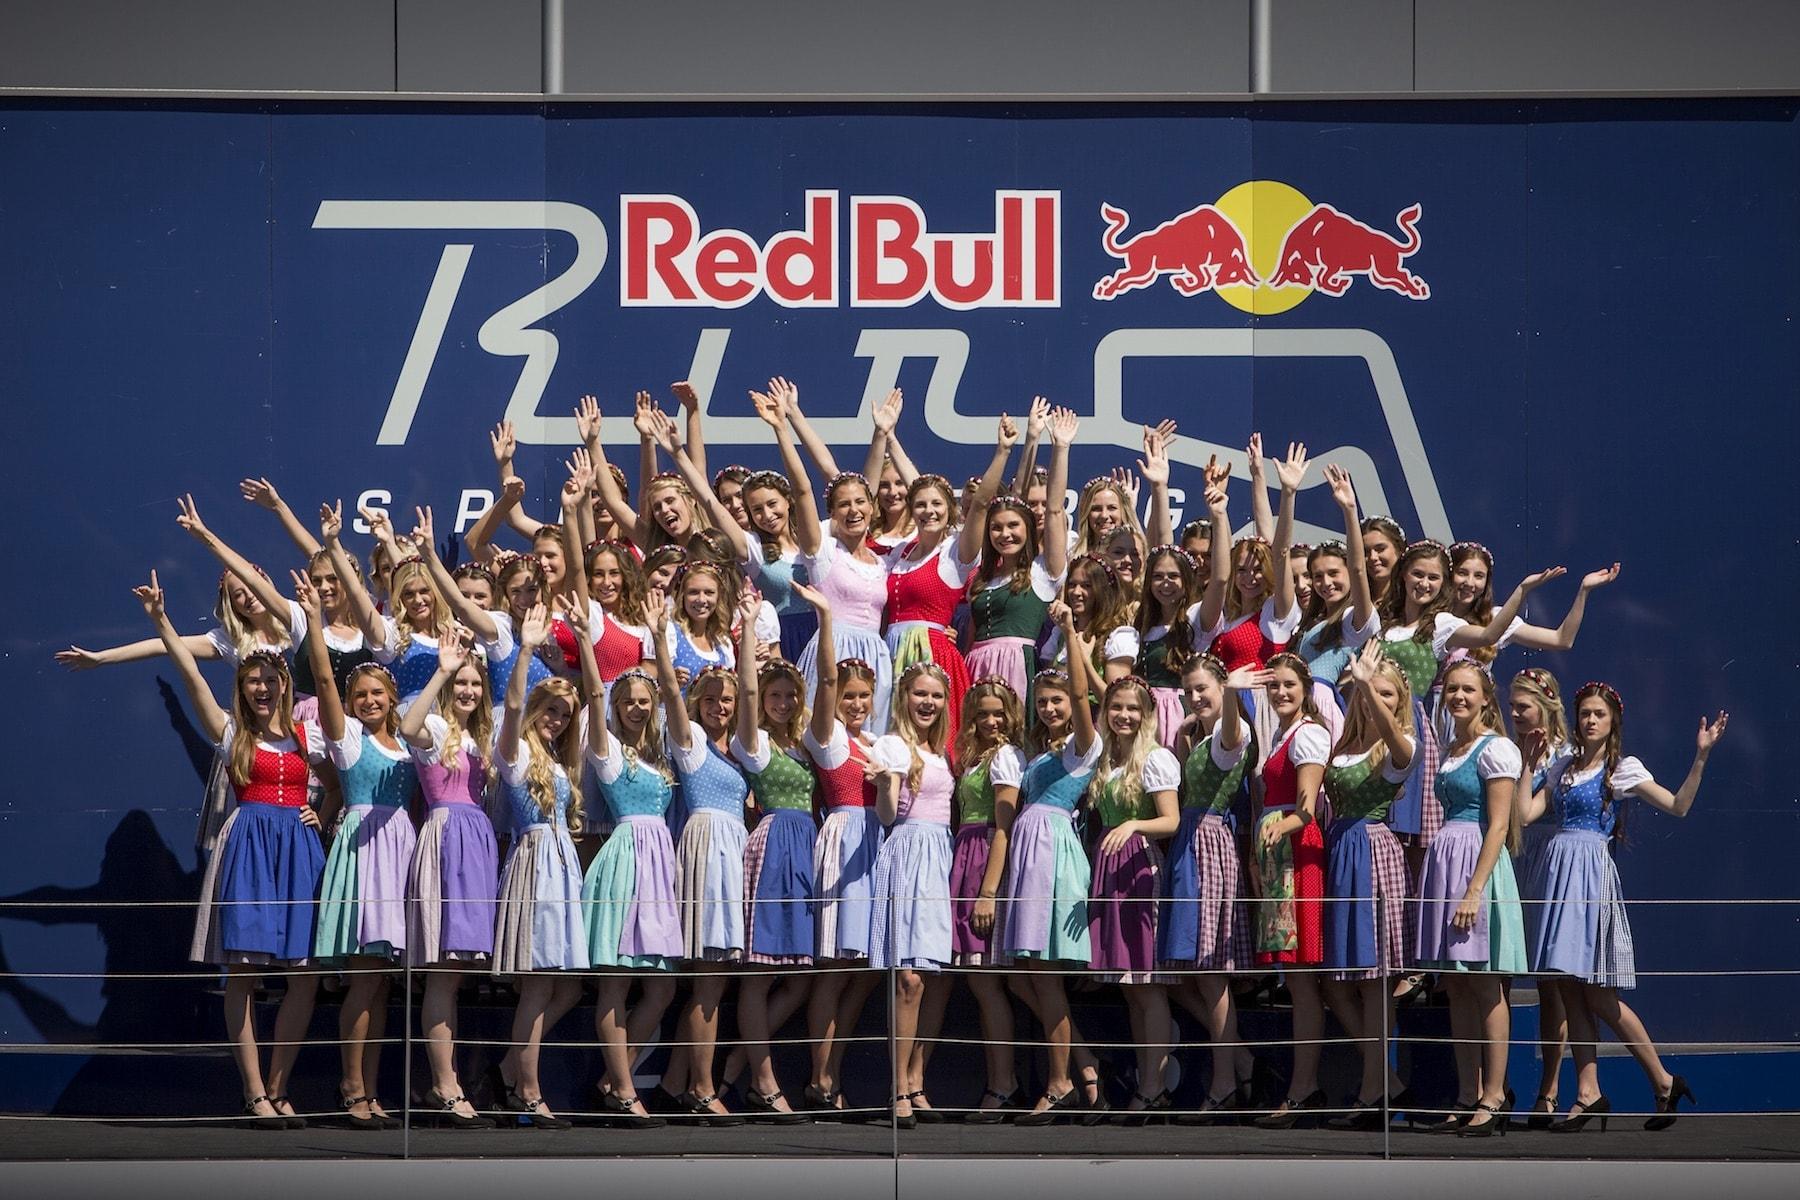 2017 Formula Unas at Austria photo by Matthias Heschl:Red Bull copy.jpg